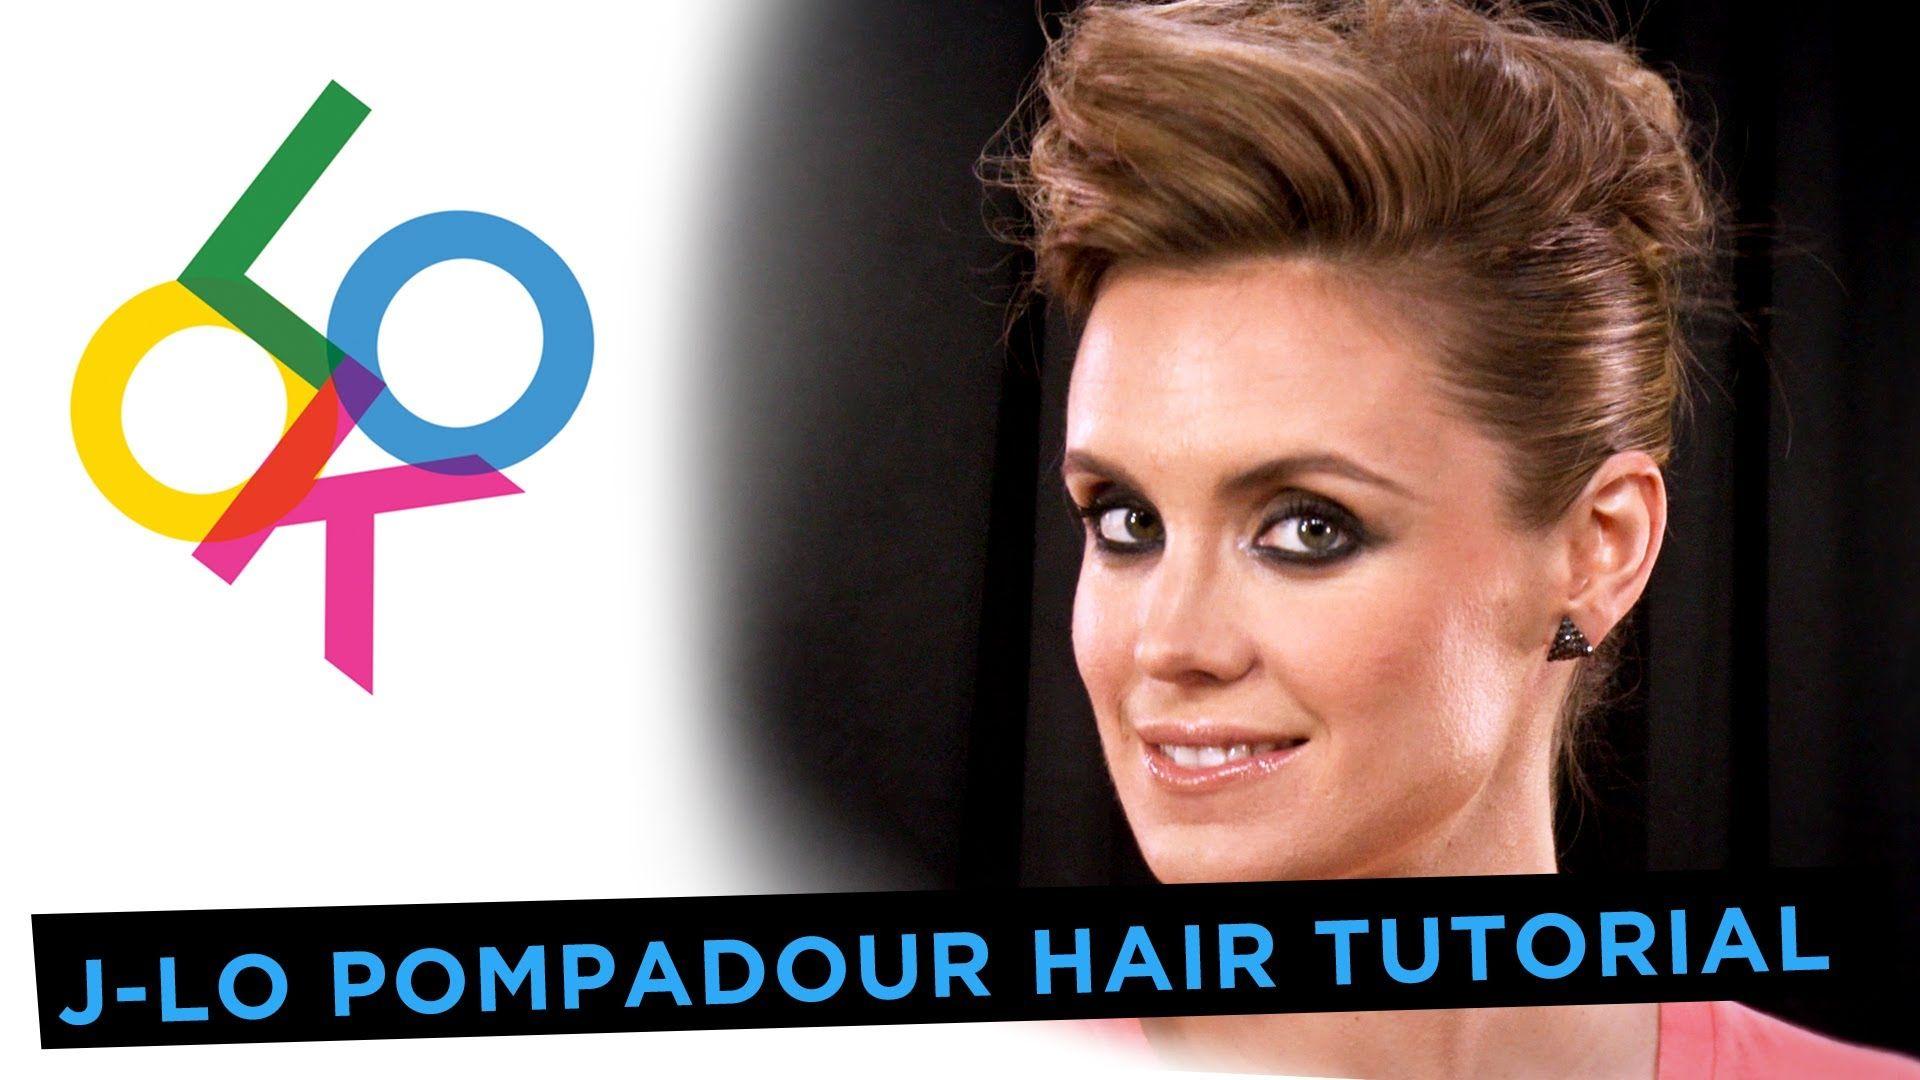 Pompadour Hair Tutorial - How To Get Jennifer Lopez's Look